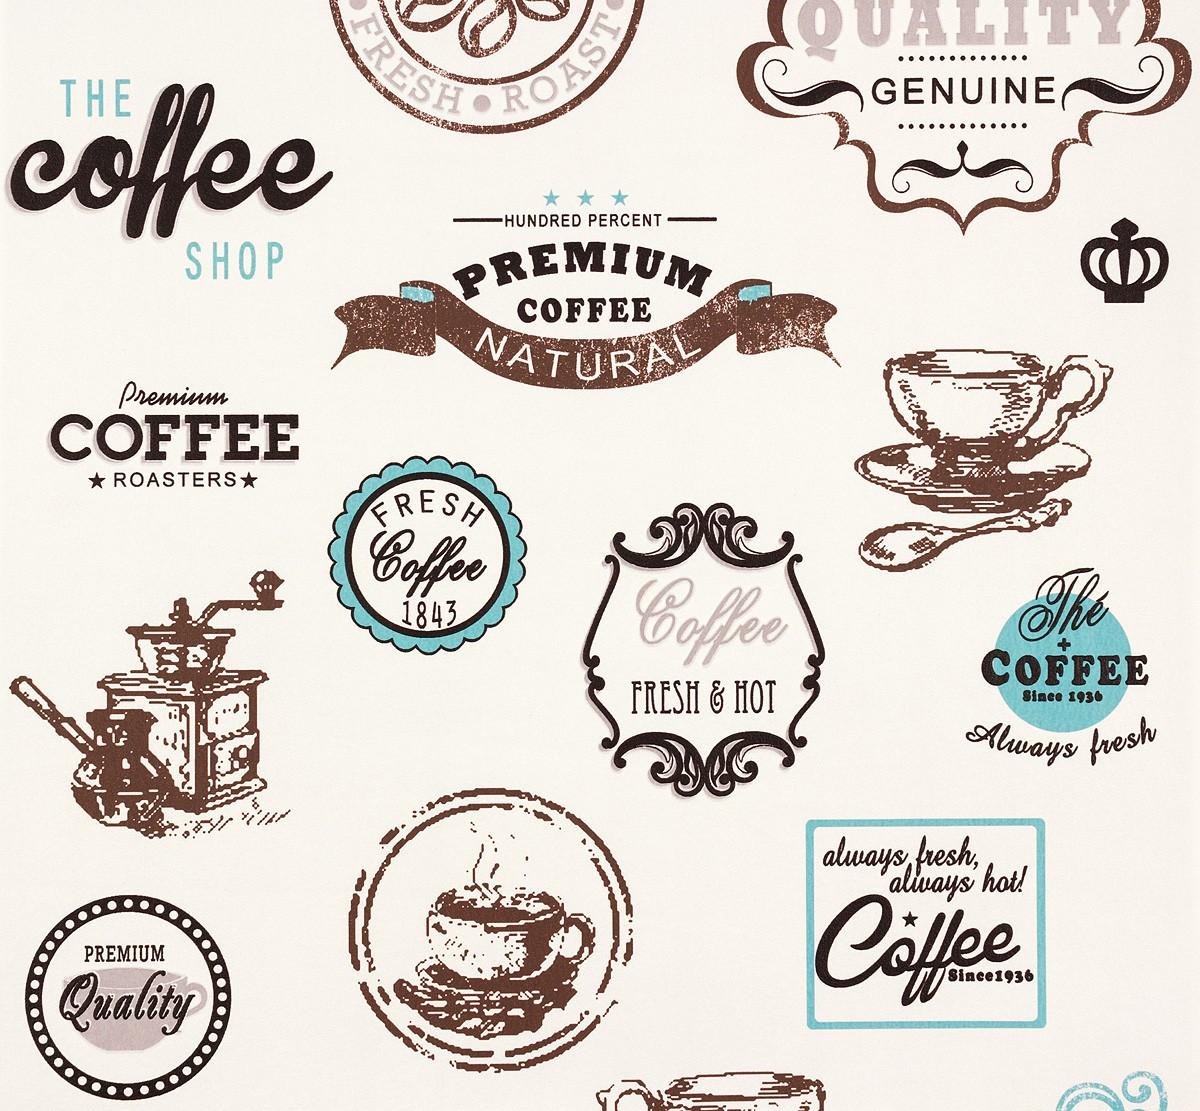 Vliestapete Cappuccino Tapeten : Vliestapete wei? K?che Coffee PS 13303-10